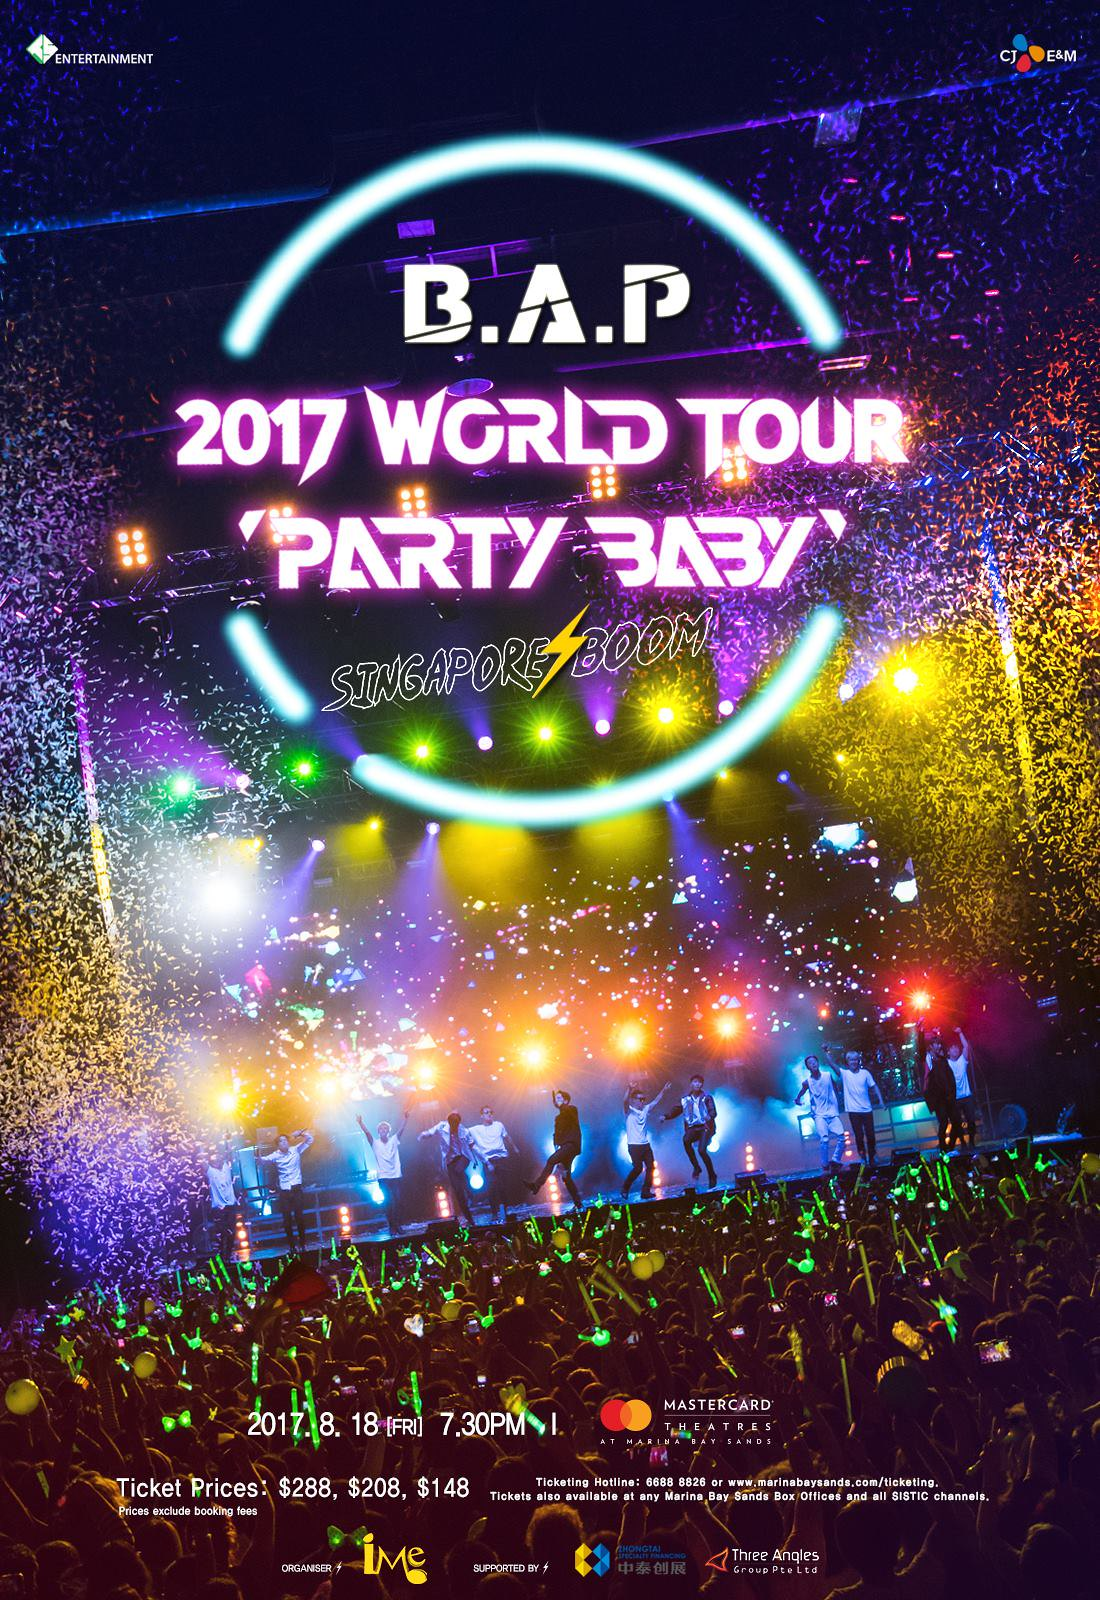 BAP World Tour in Singapore